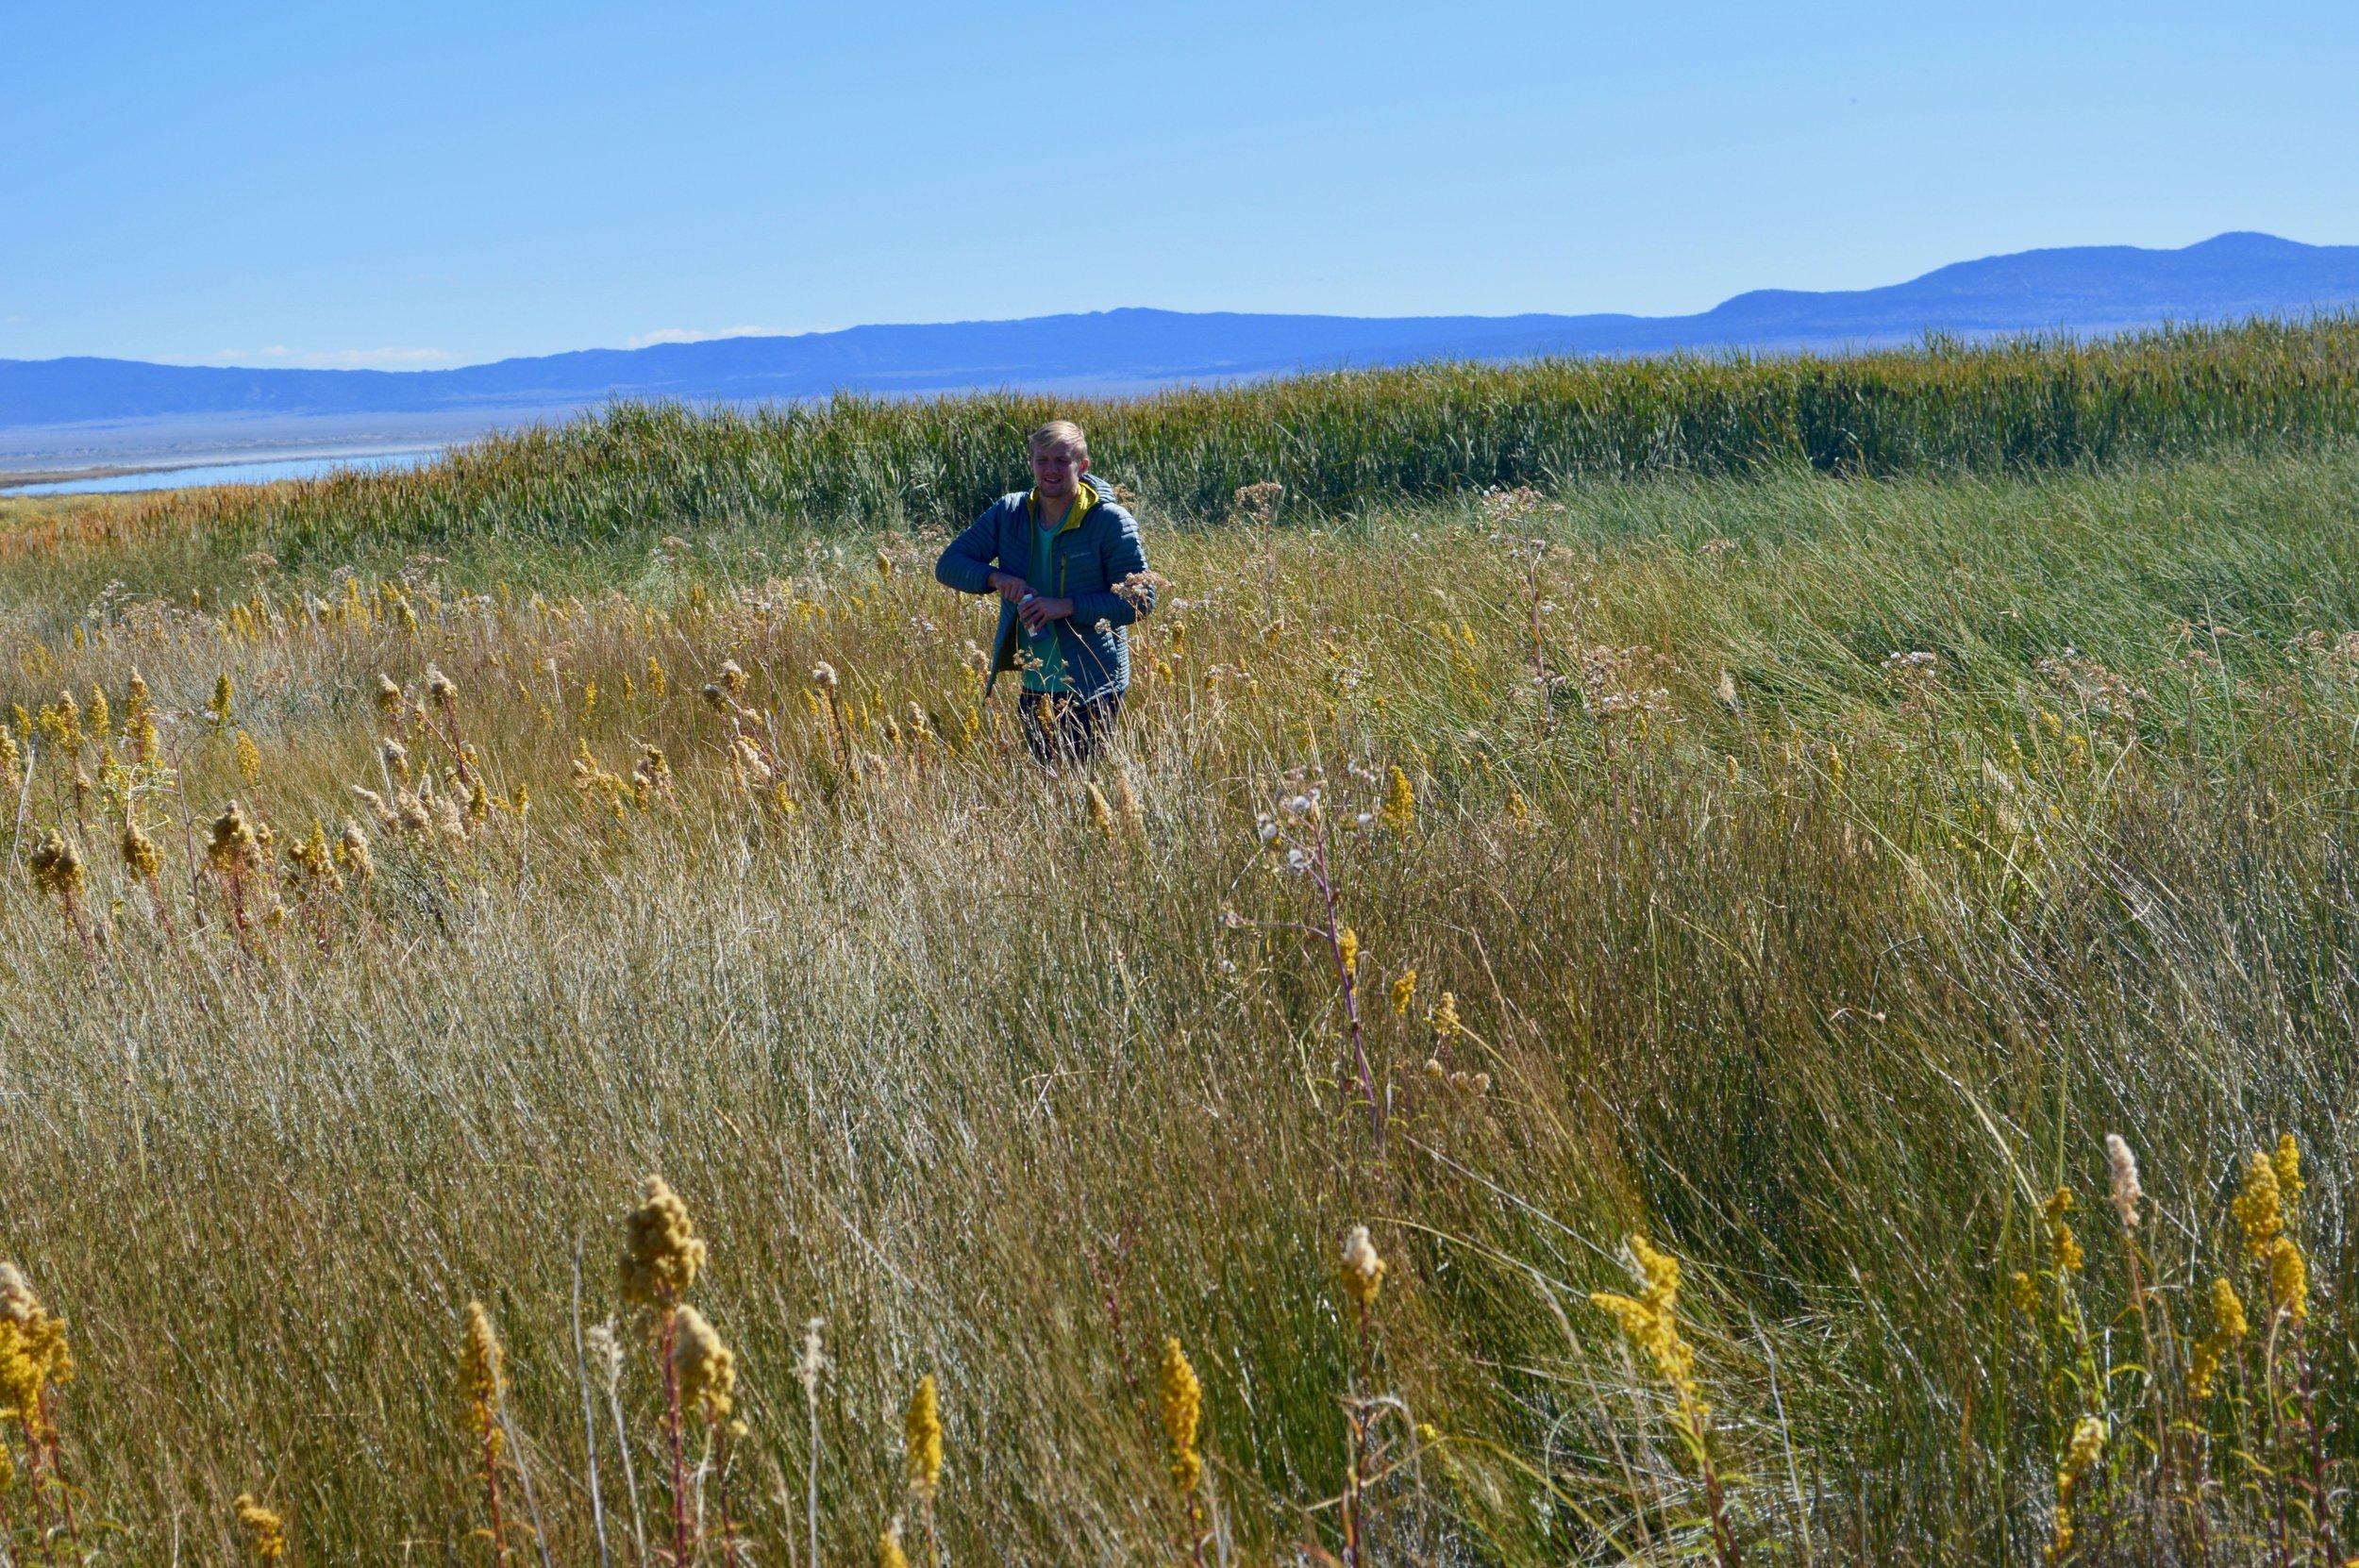 Noah Jemison (University of Illinois) hunting for springs on the north shore of Mono Lake